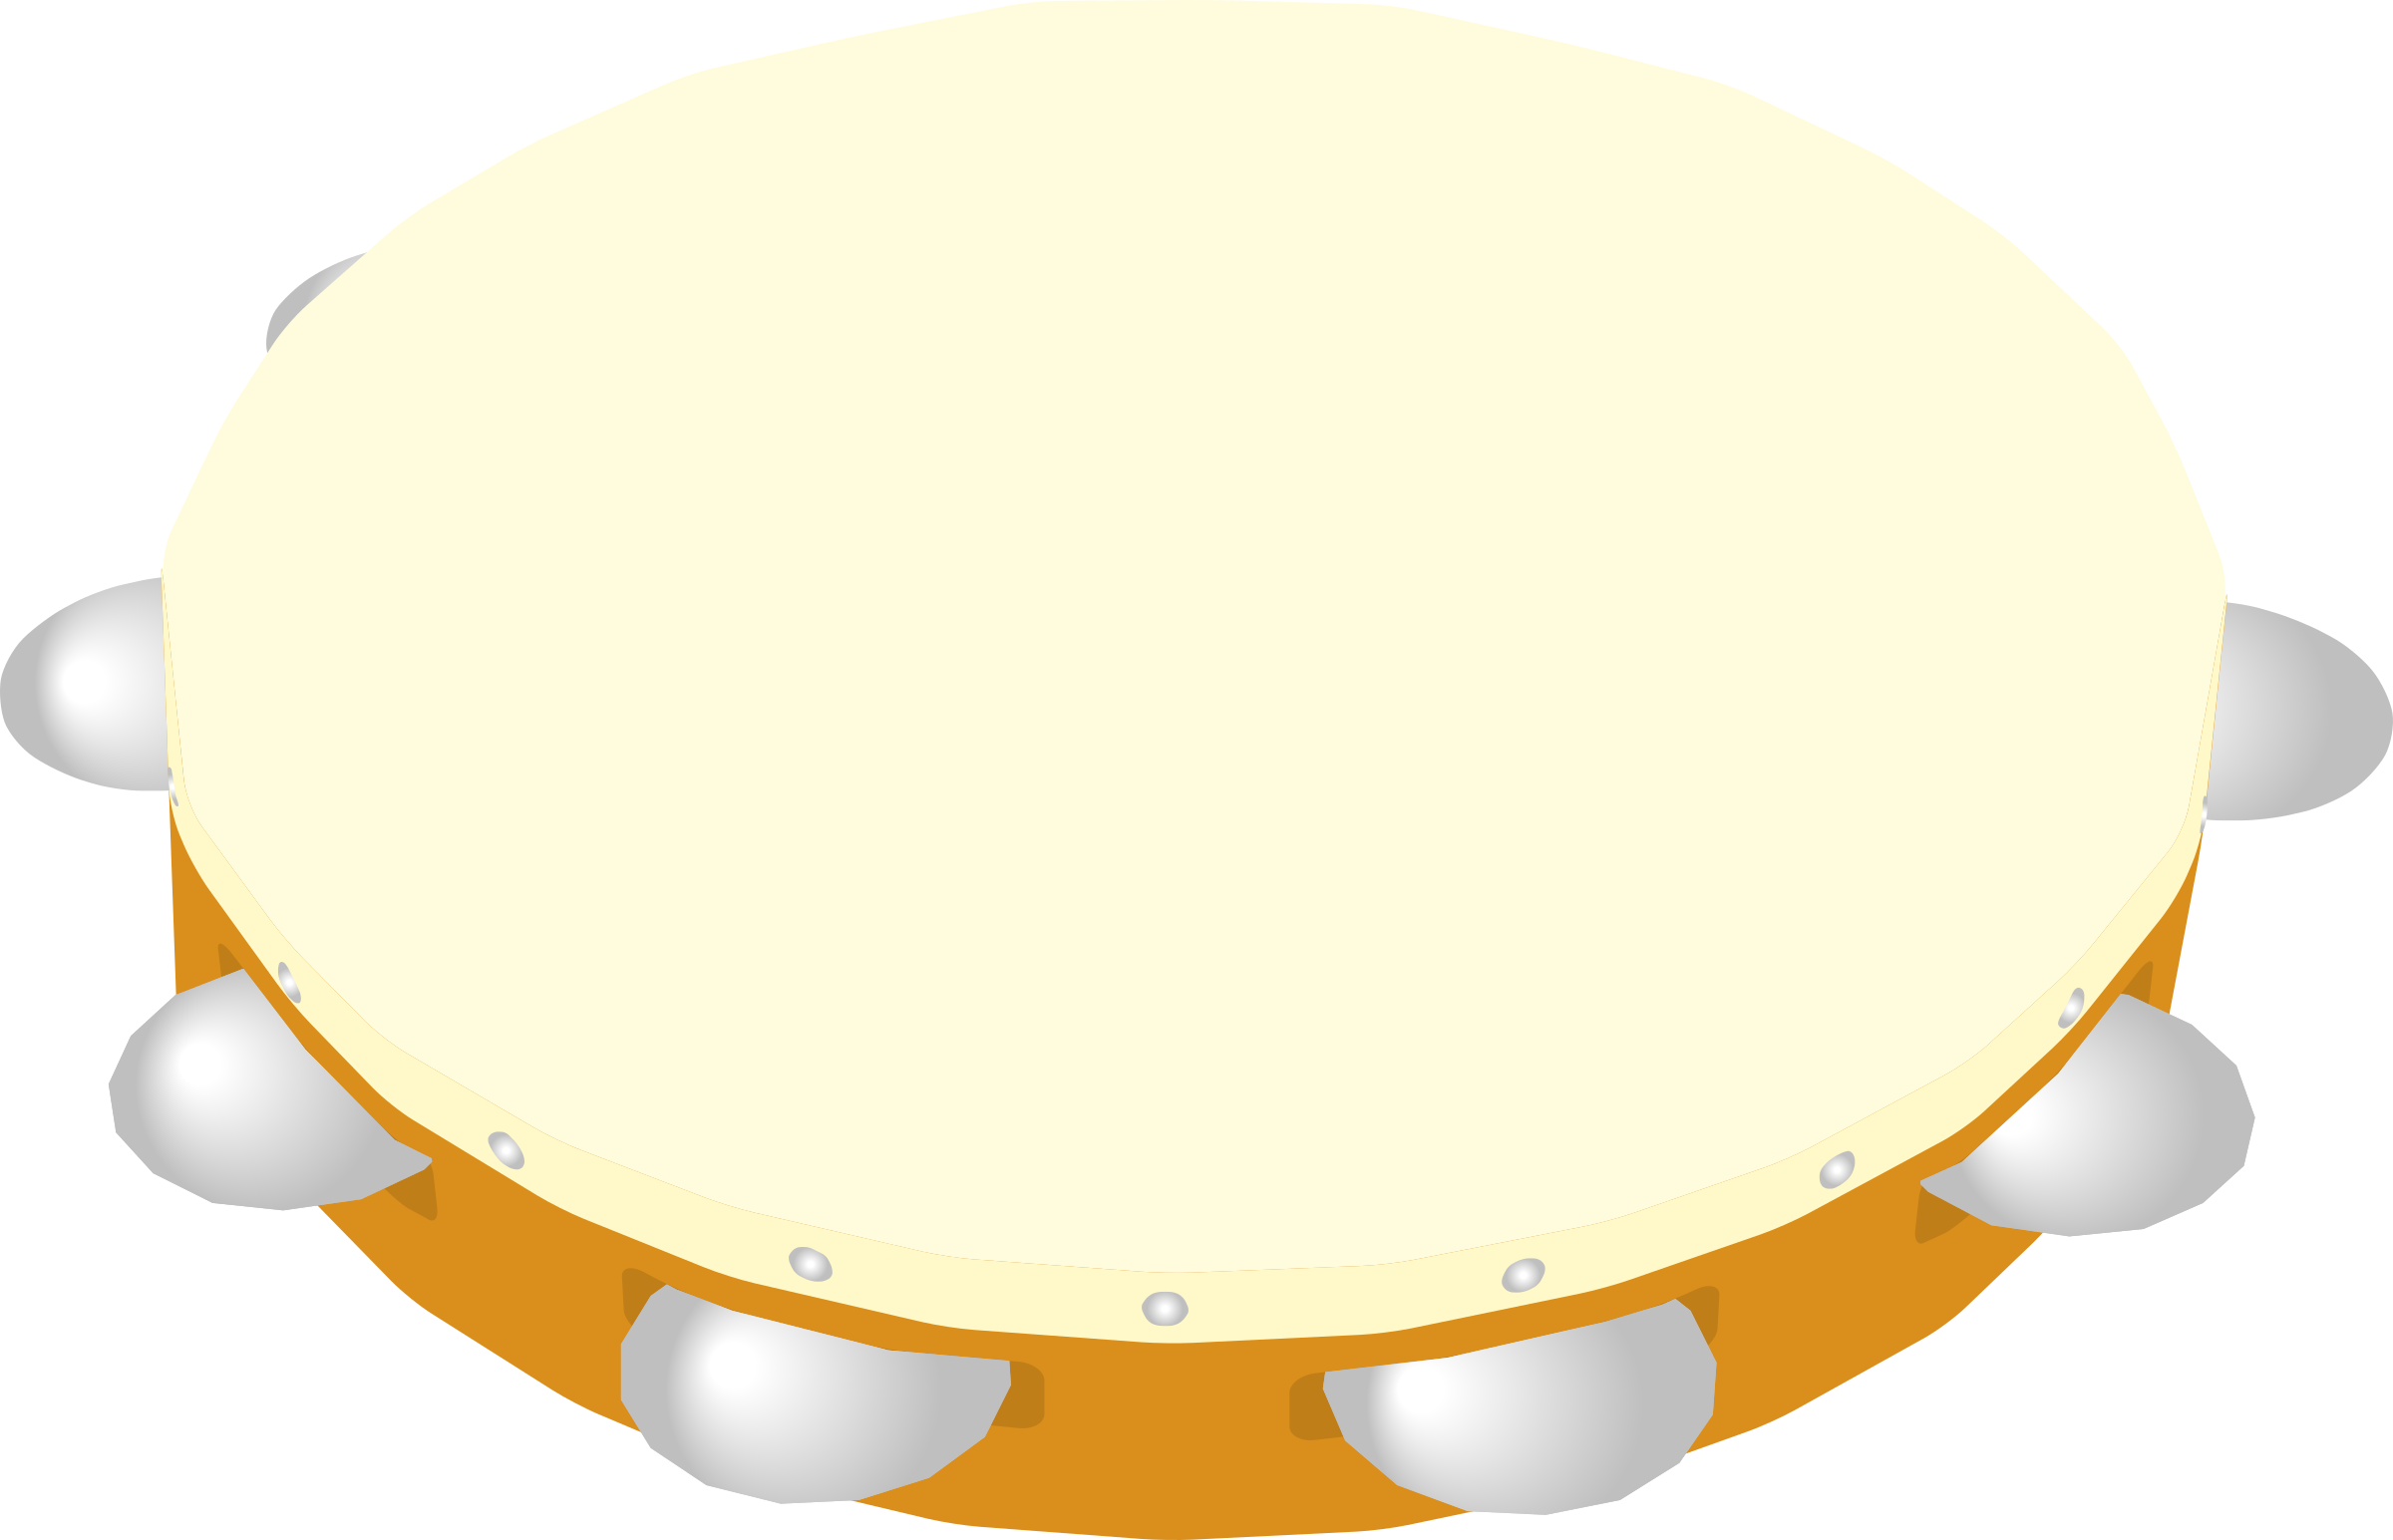 Big image png. Dancer clipart tambourine